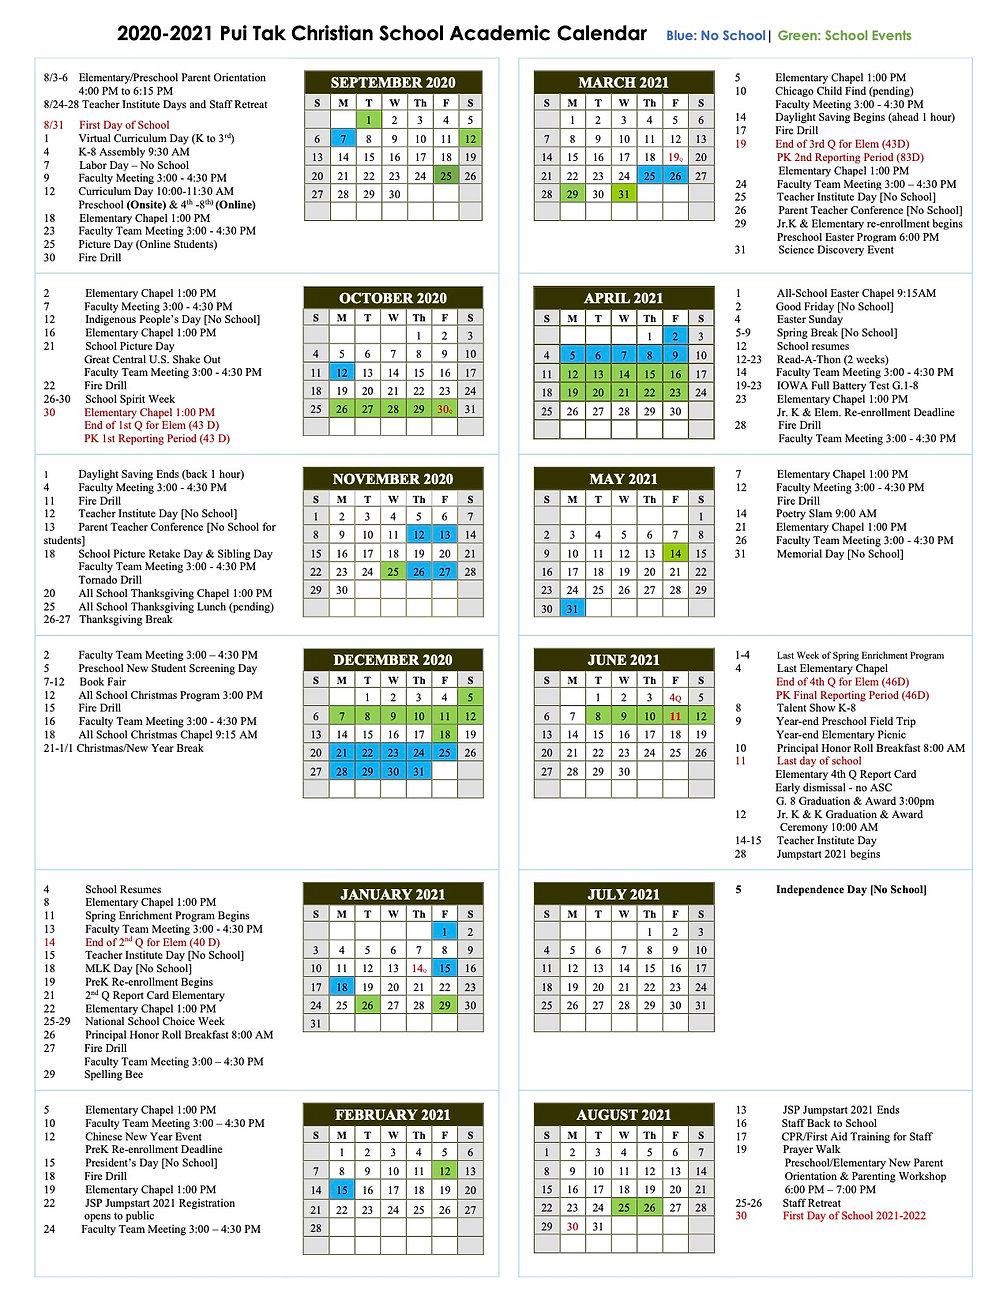 2020-2021 School Calendar JPEG.jpg